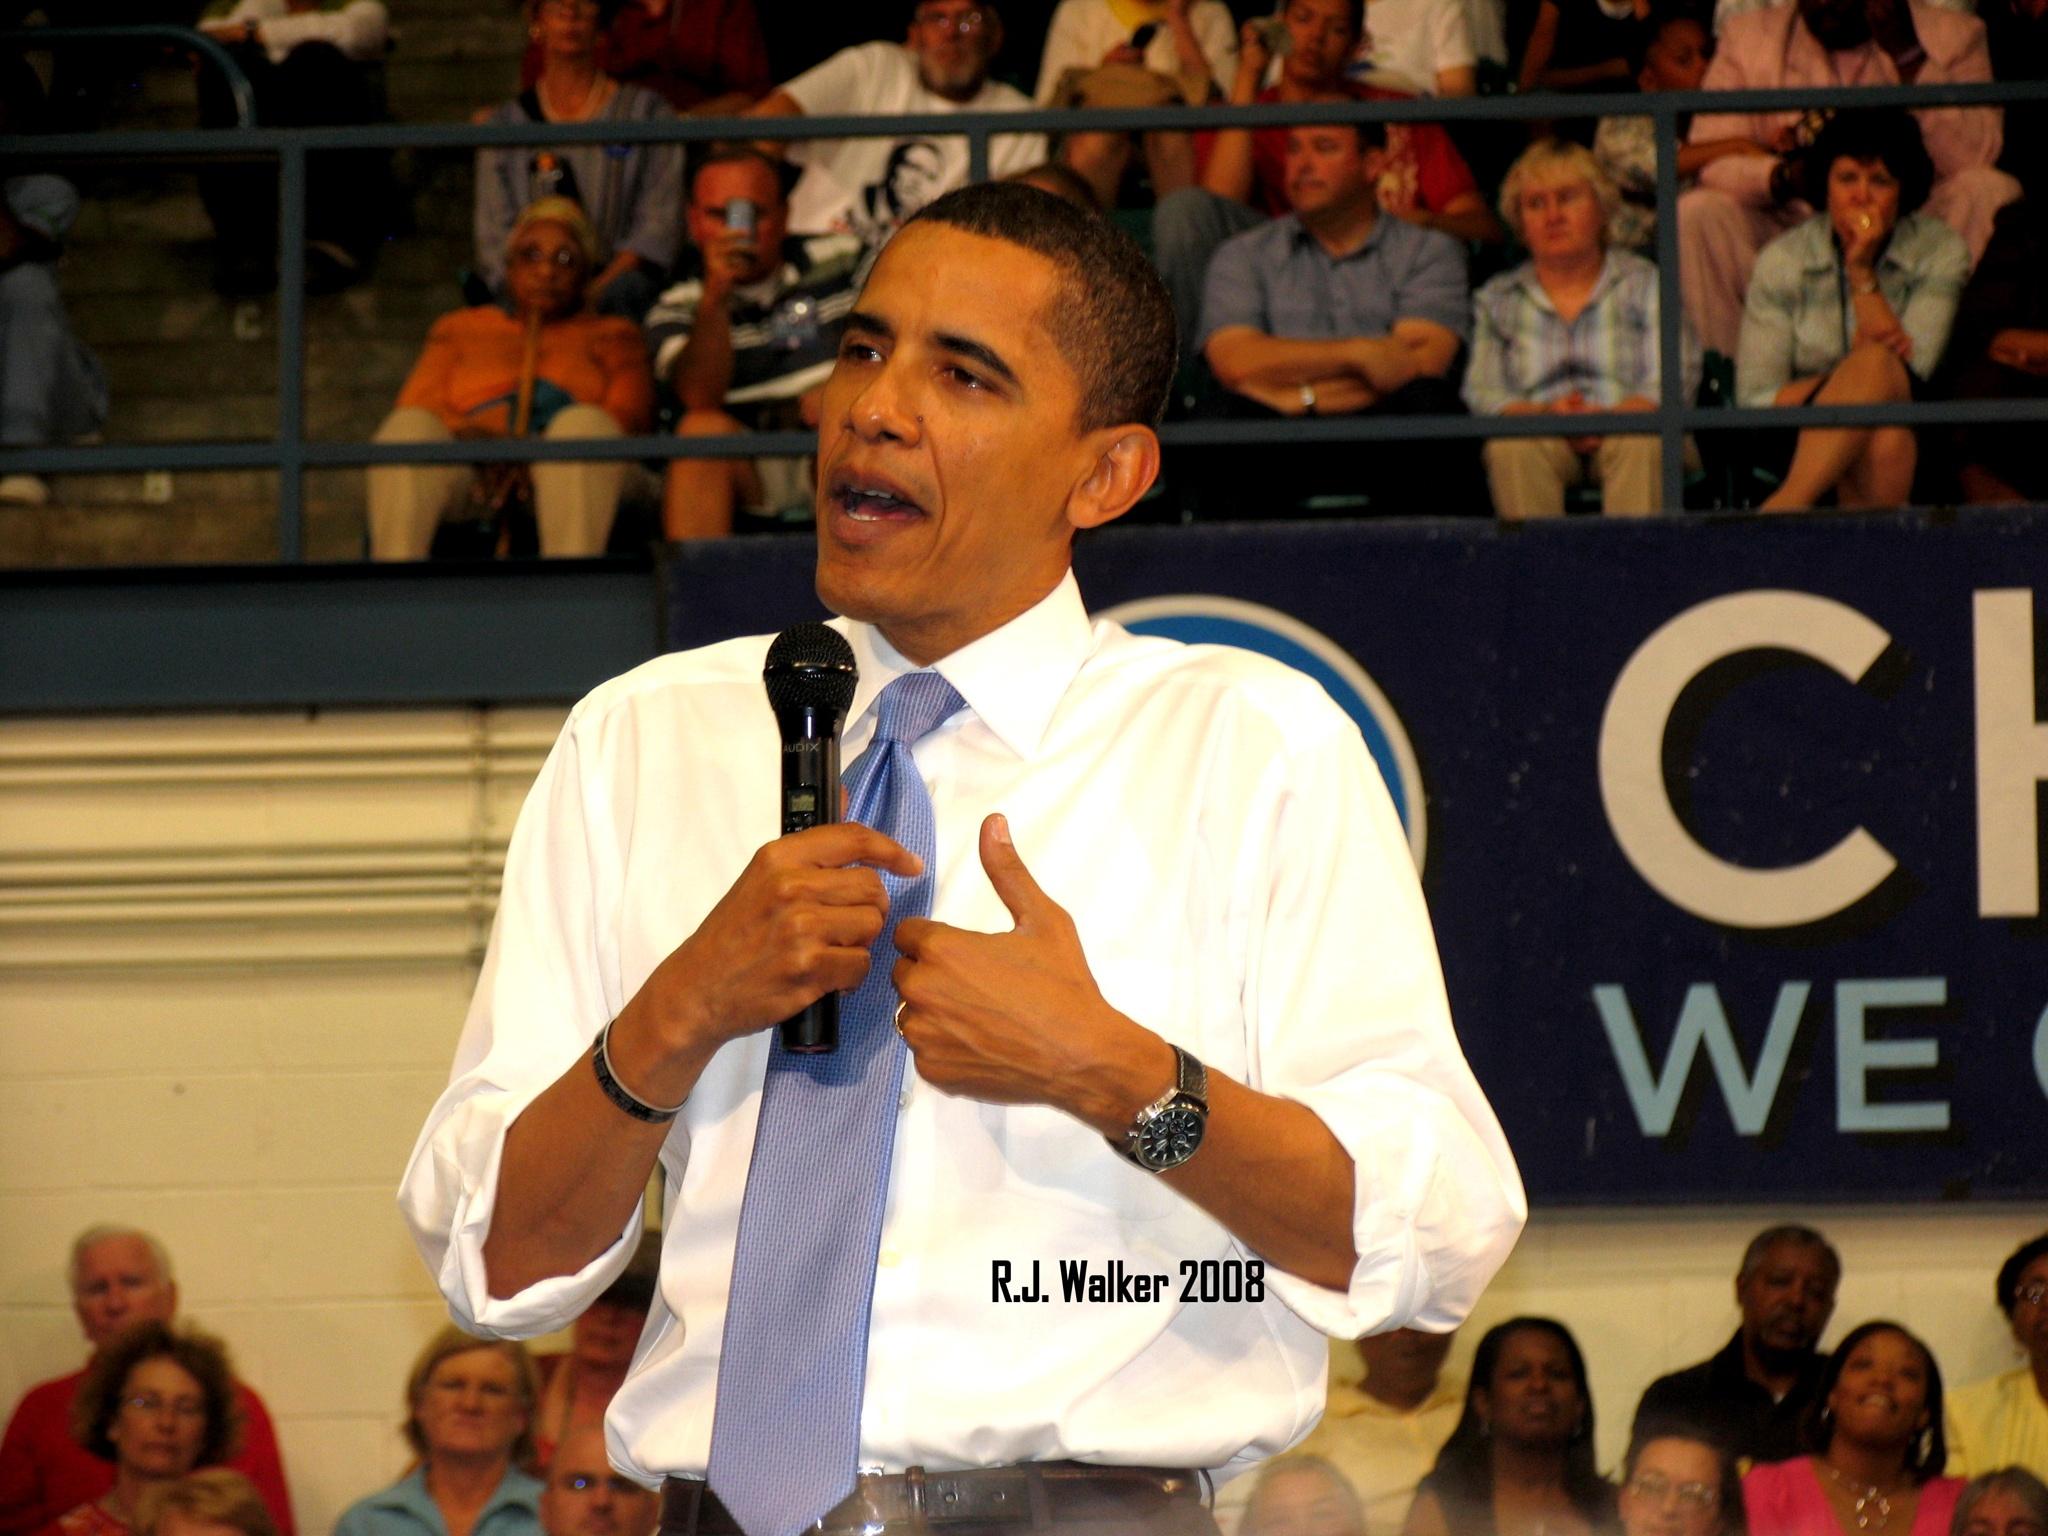 President Obama by R.J. Walker